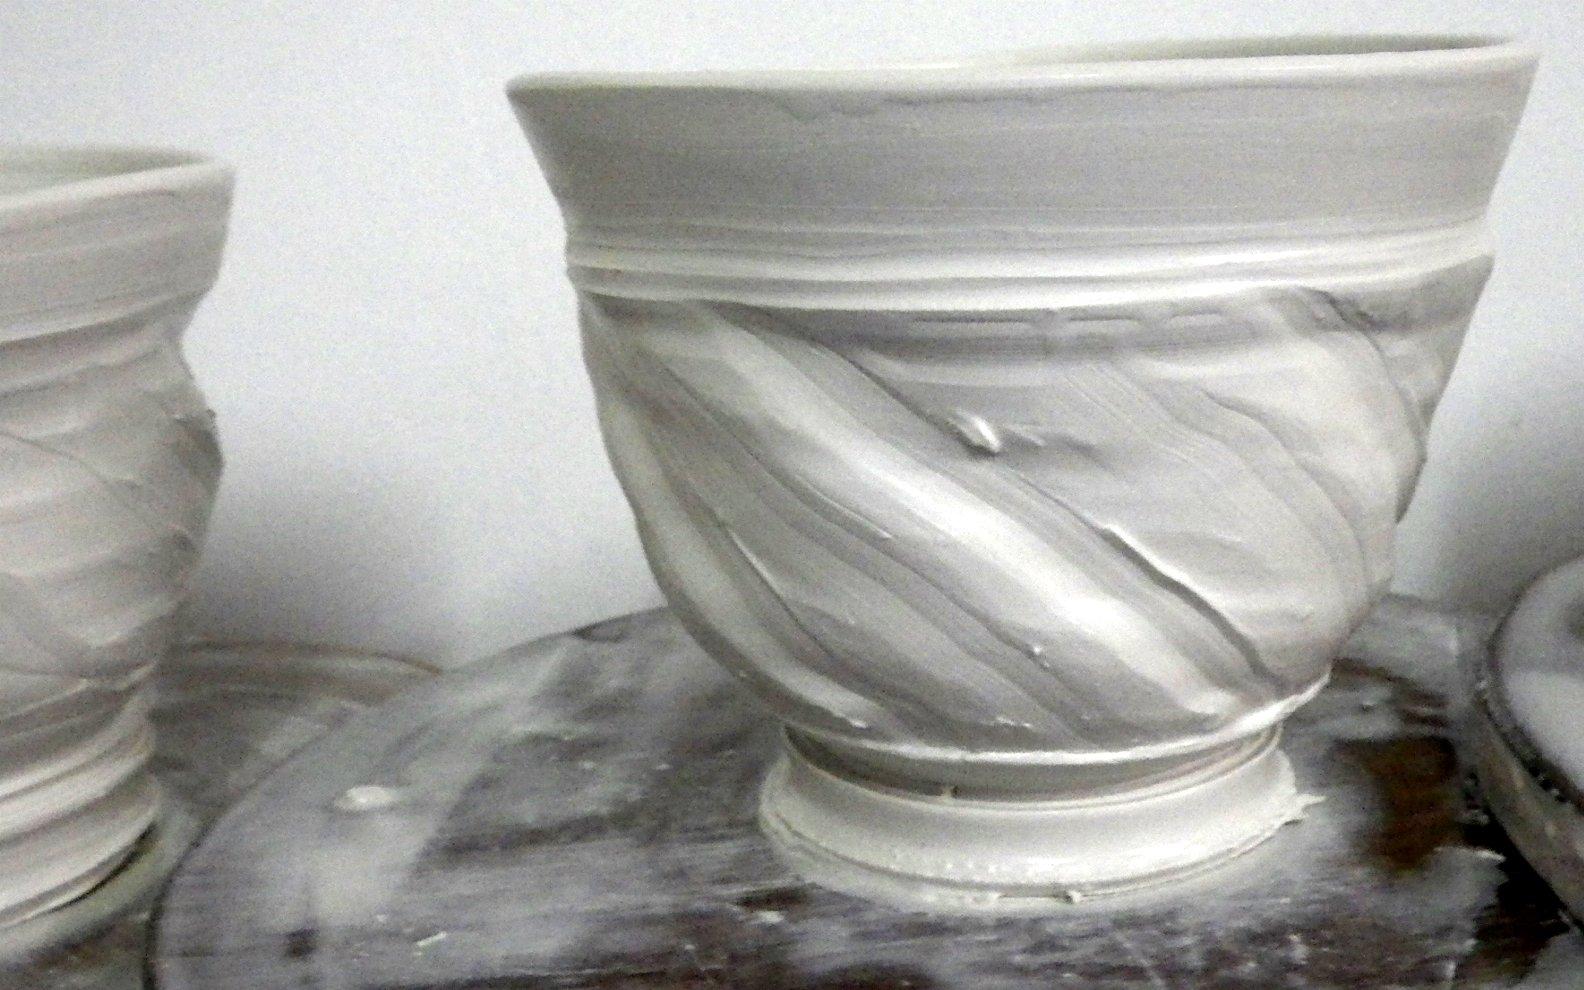 wet pots